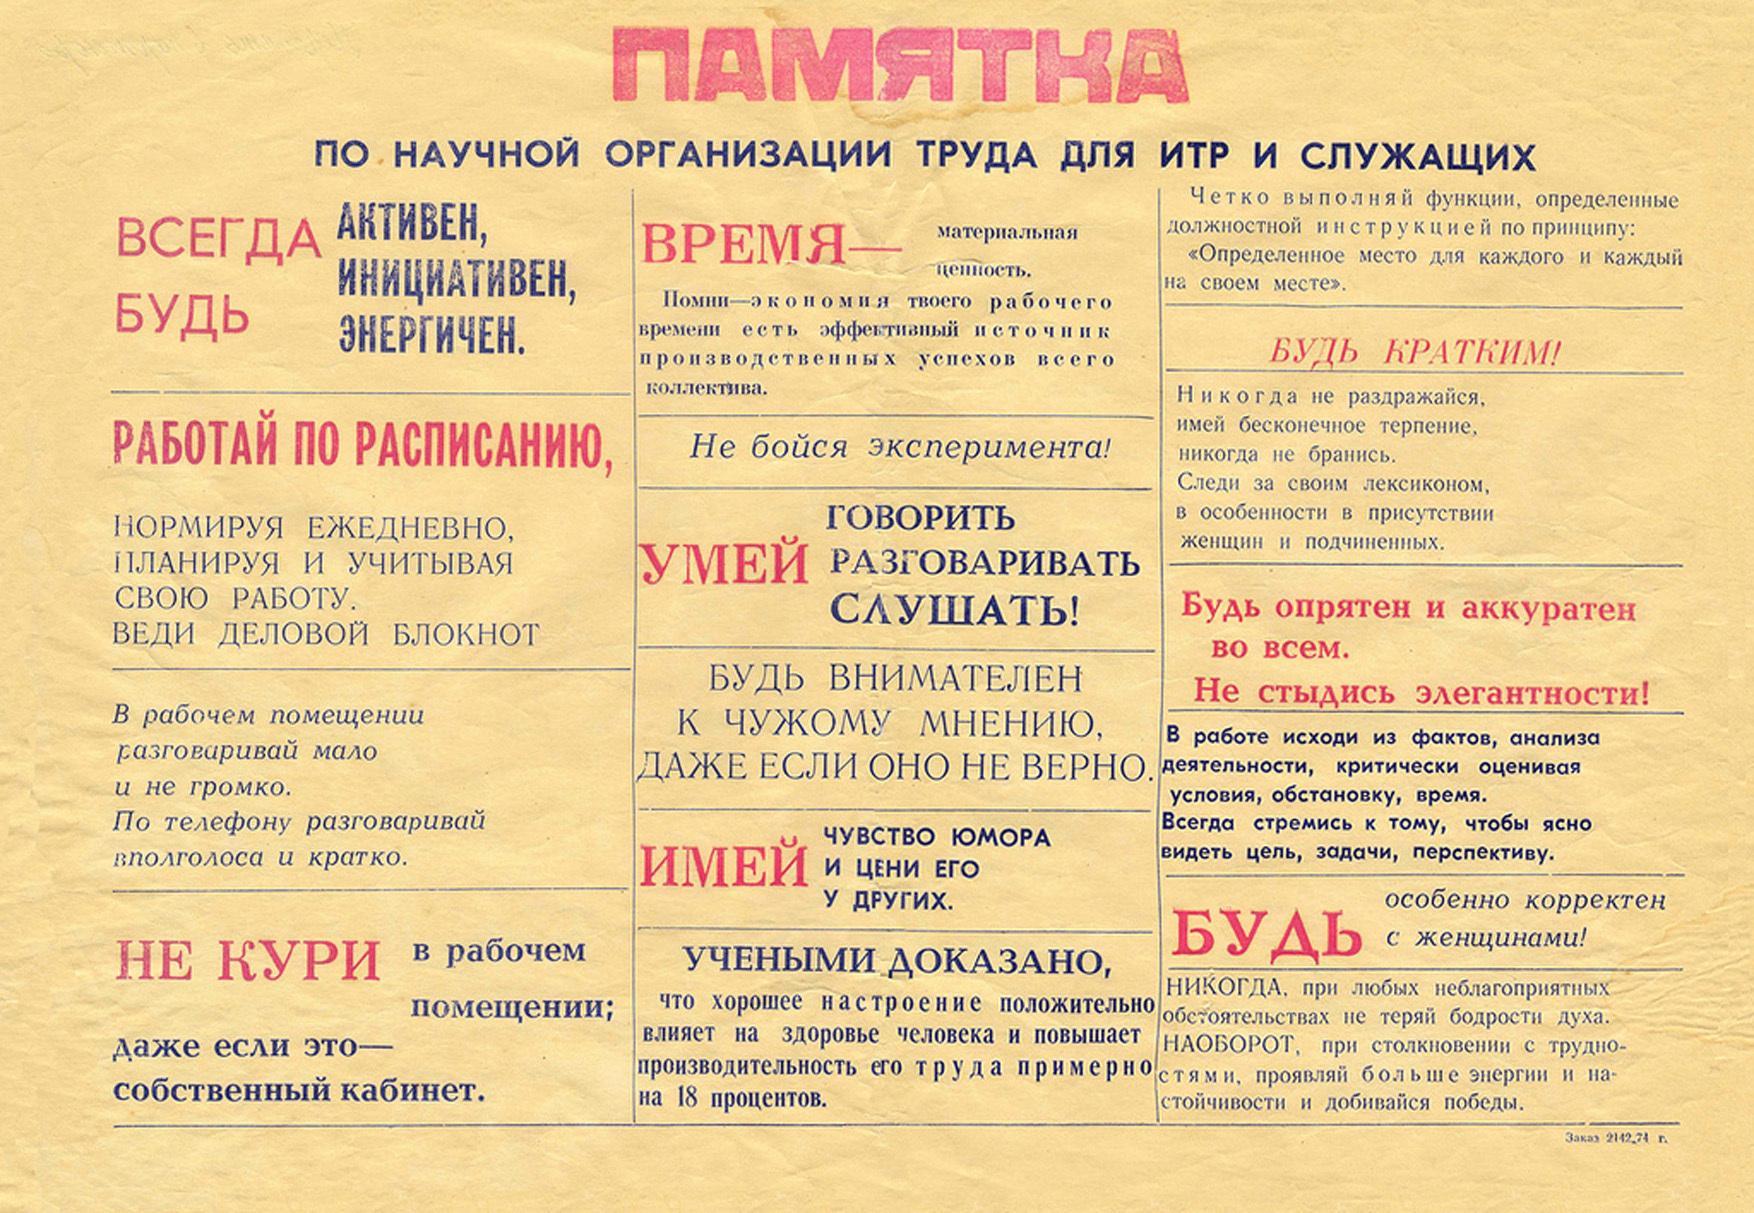 Profmcg.ru